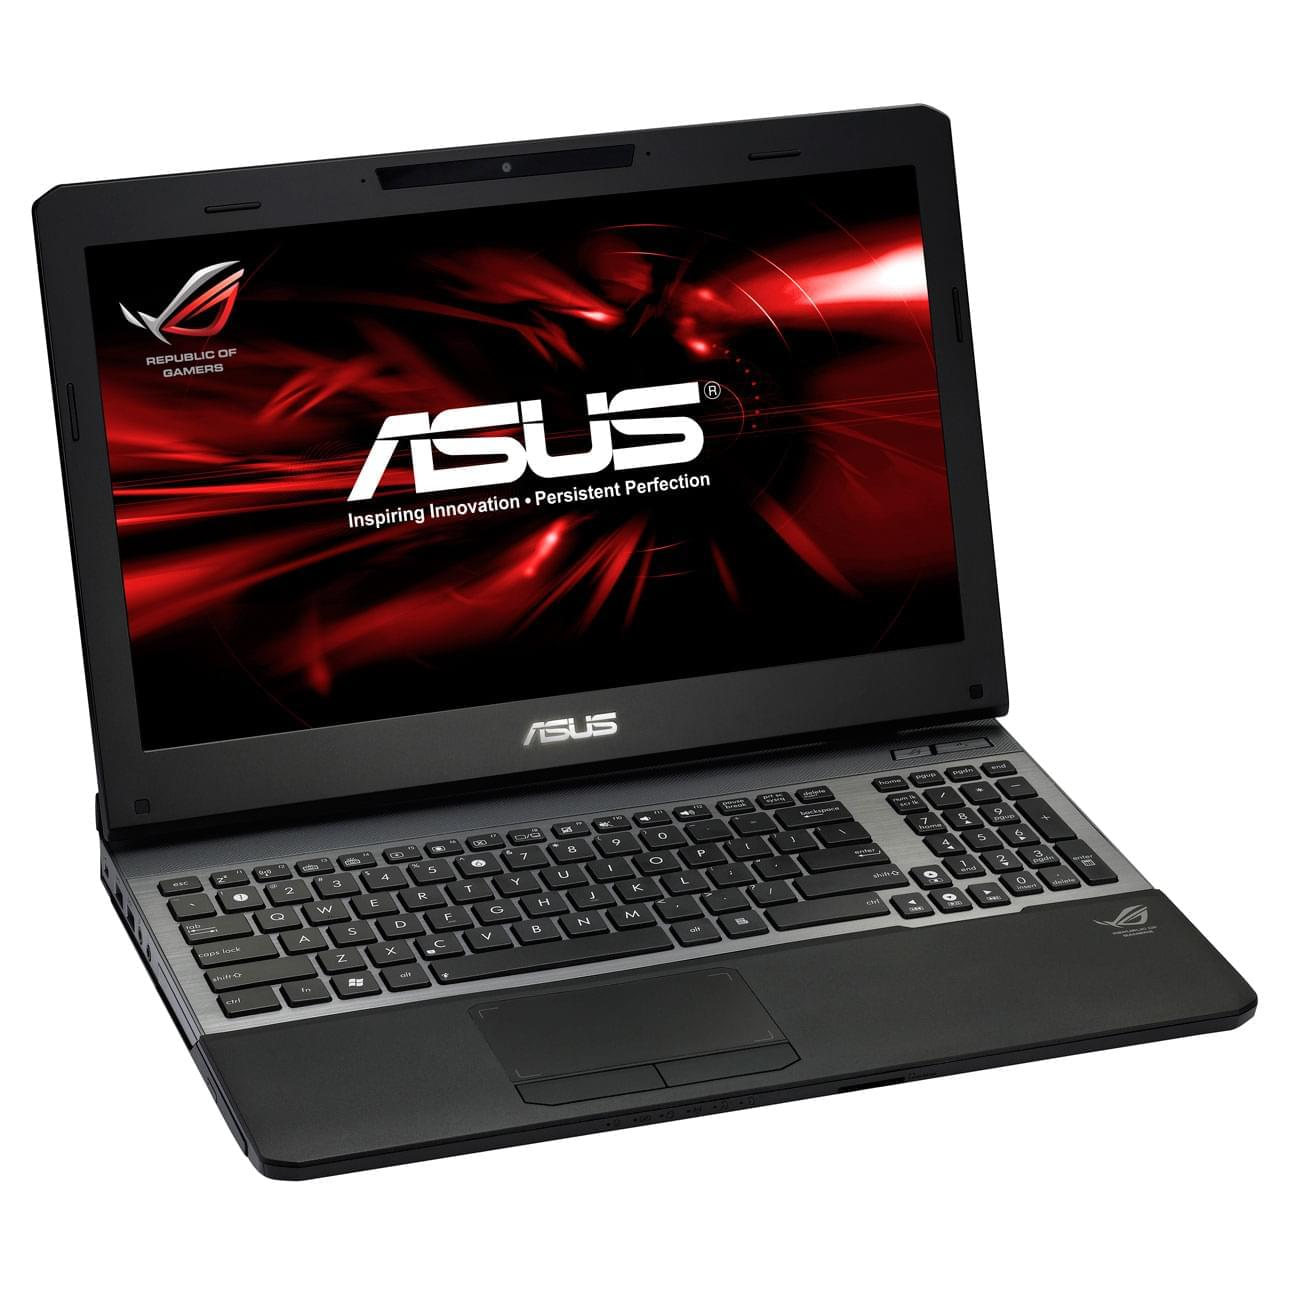 Asus G55VW-S1183H - PC portable Asus - Cybertek.fr - 0